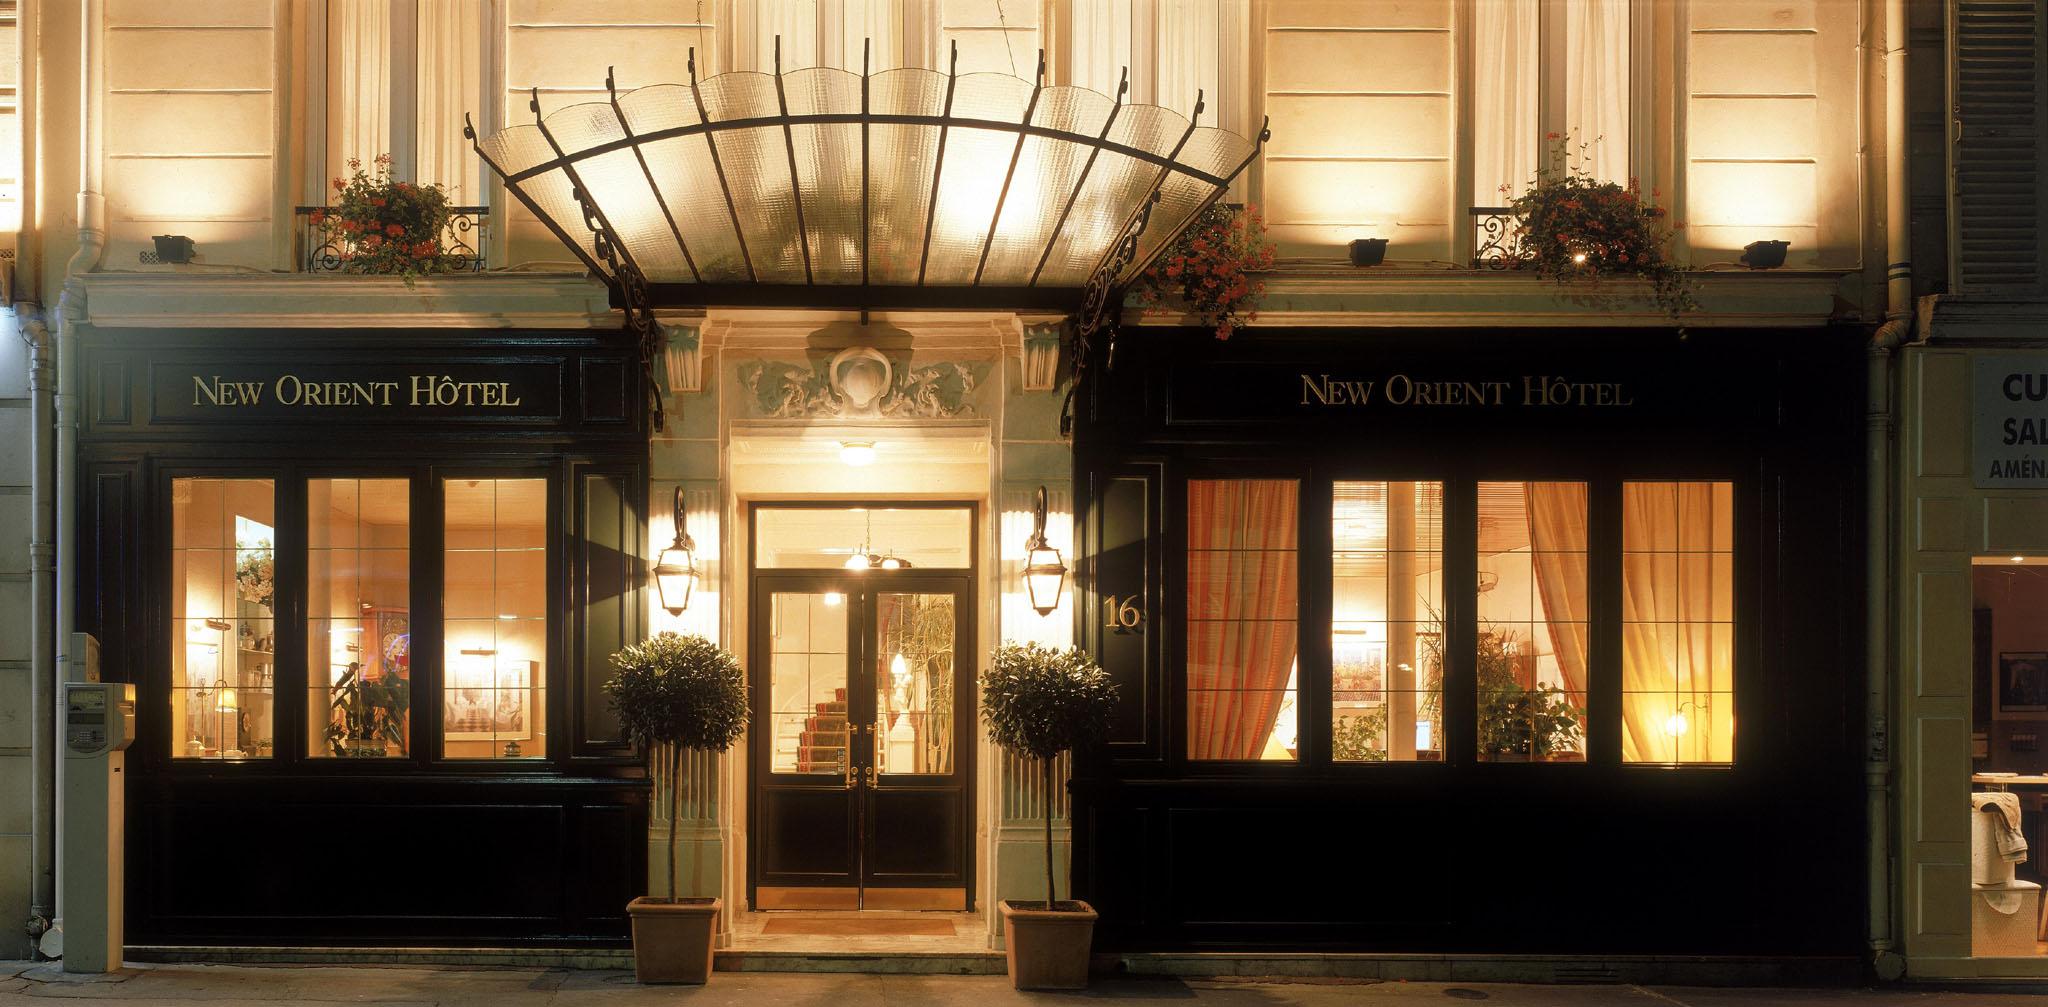 New Orient Hotel